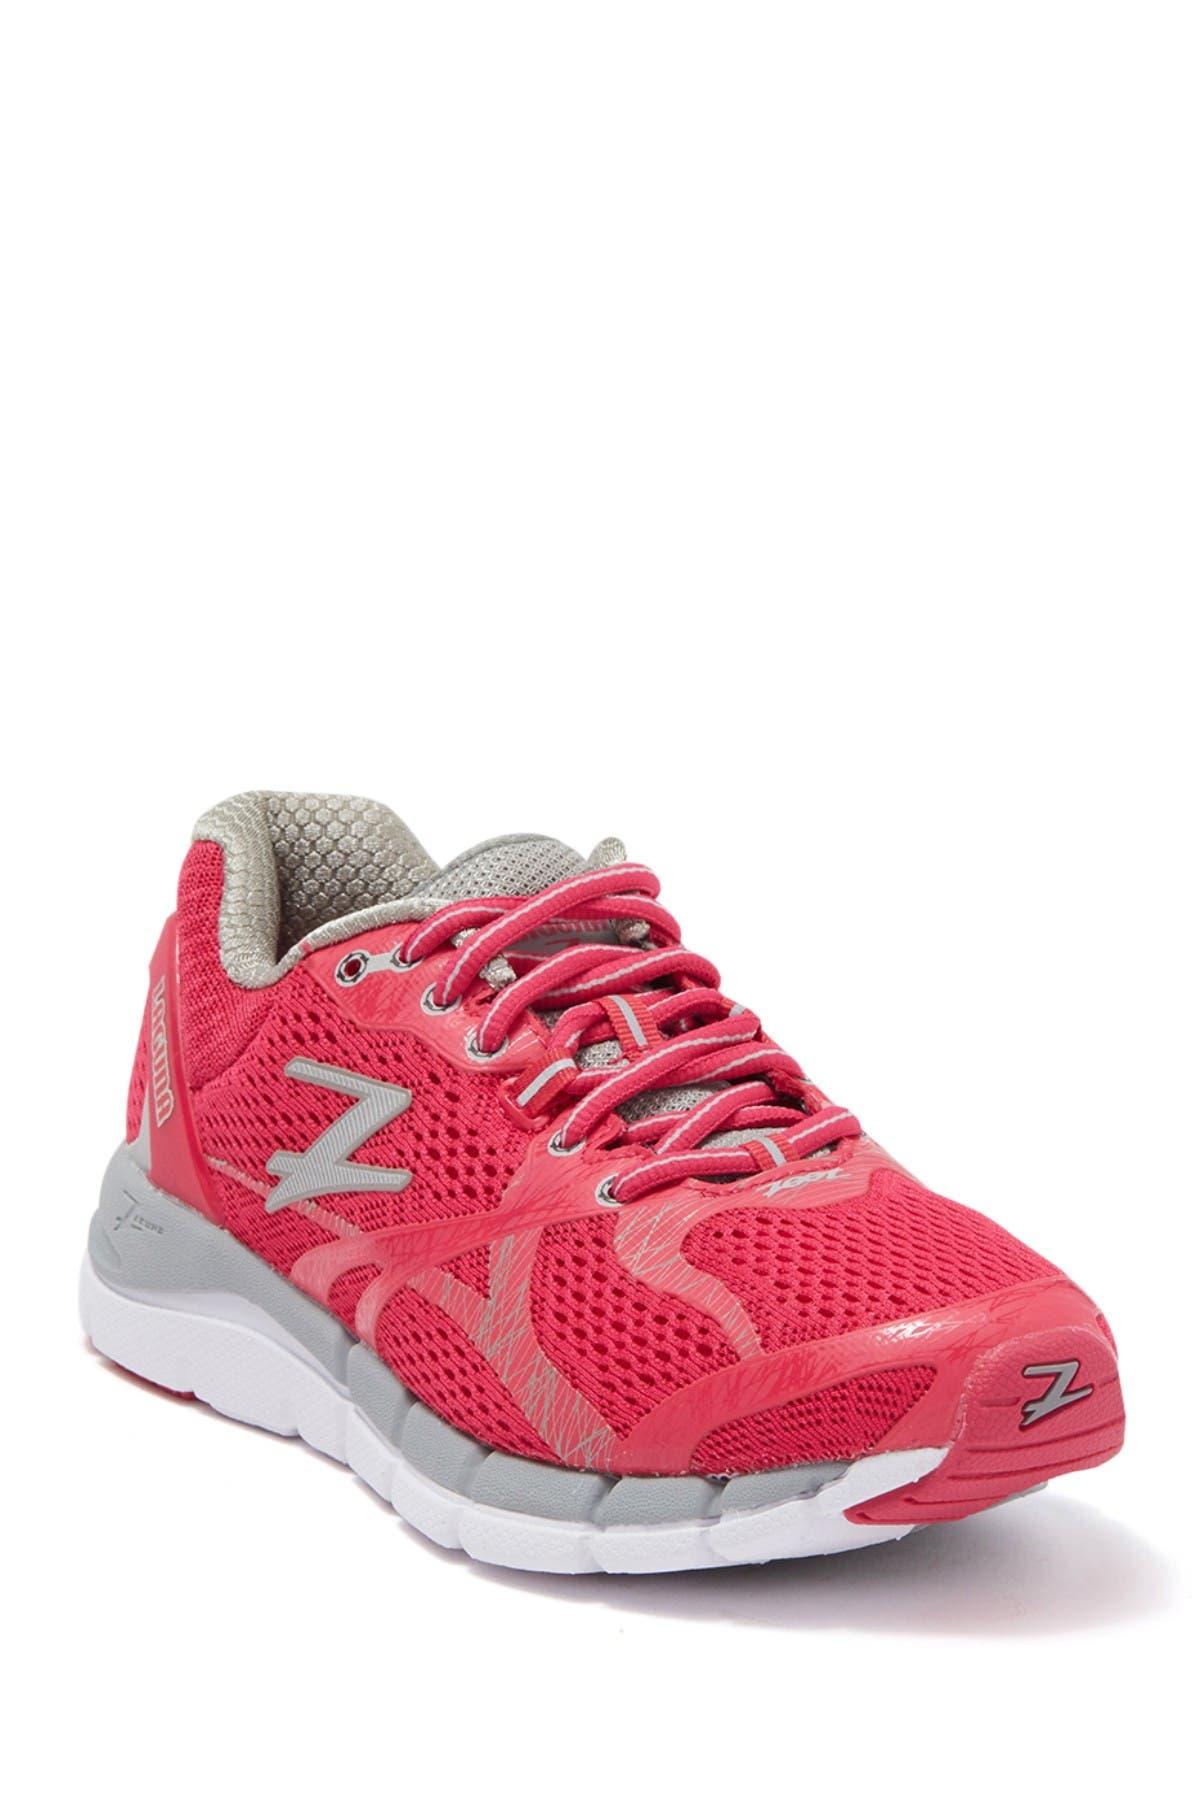 Image of Diadora Laguna Running Shoe